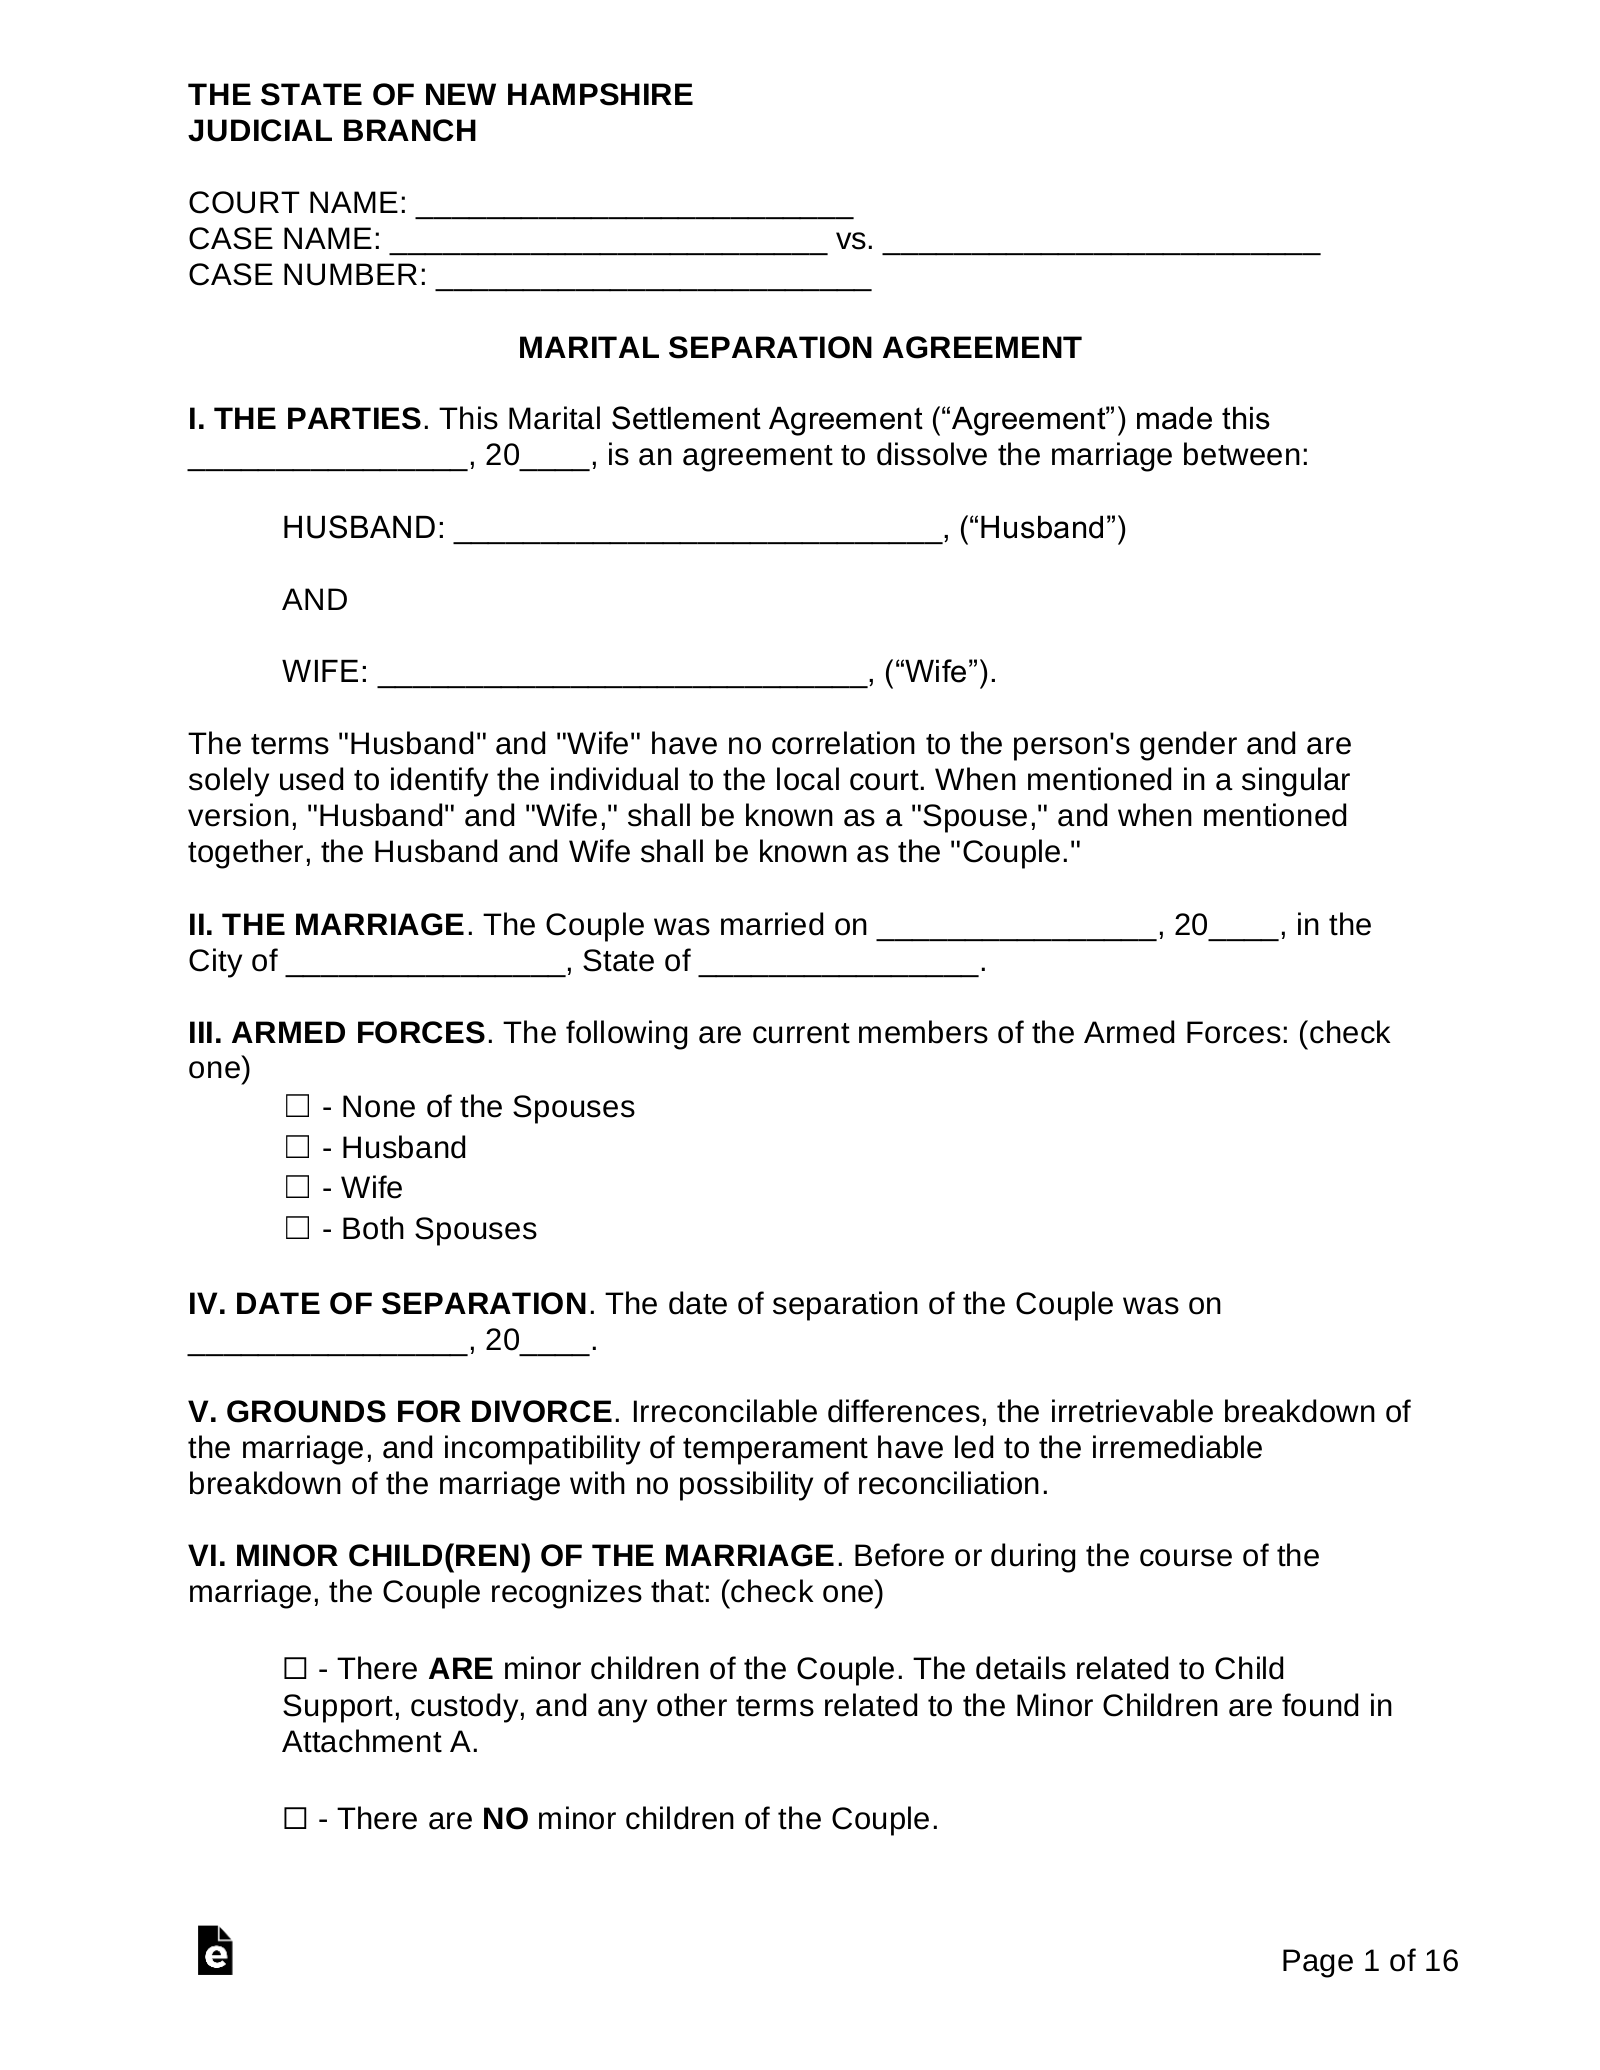 Free New Hampshire Marital Settlement Agreement